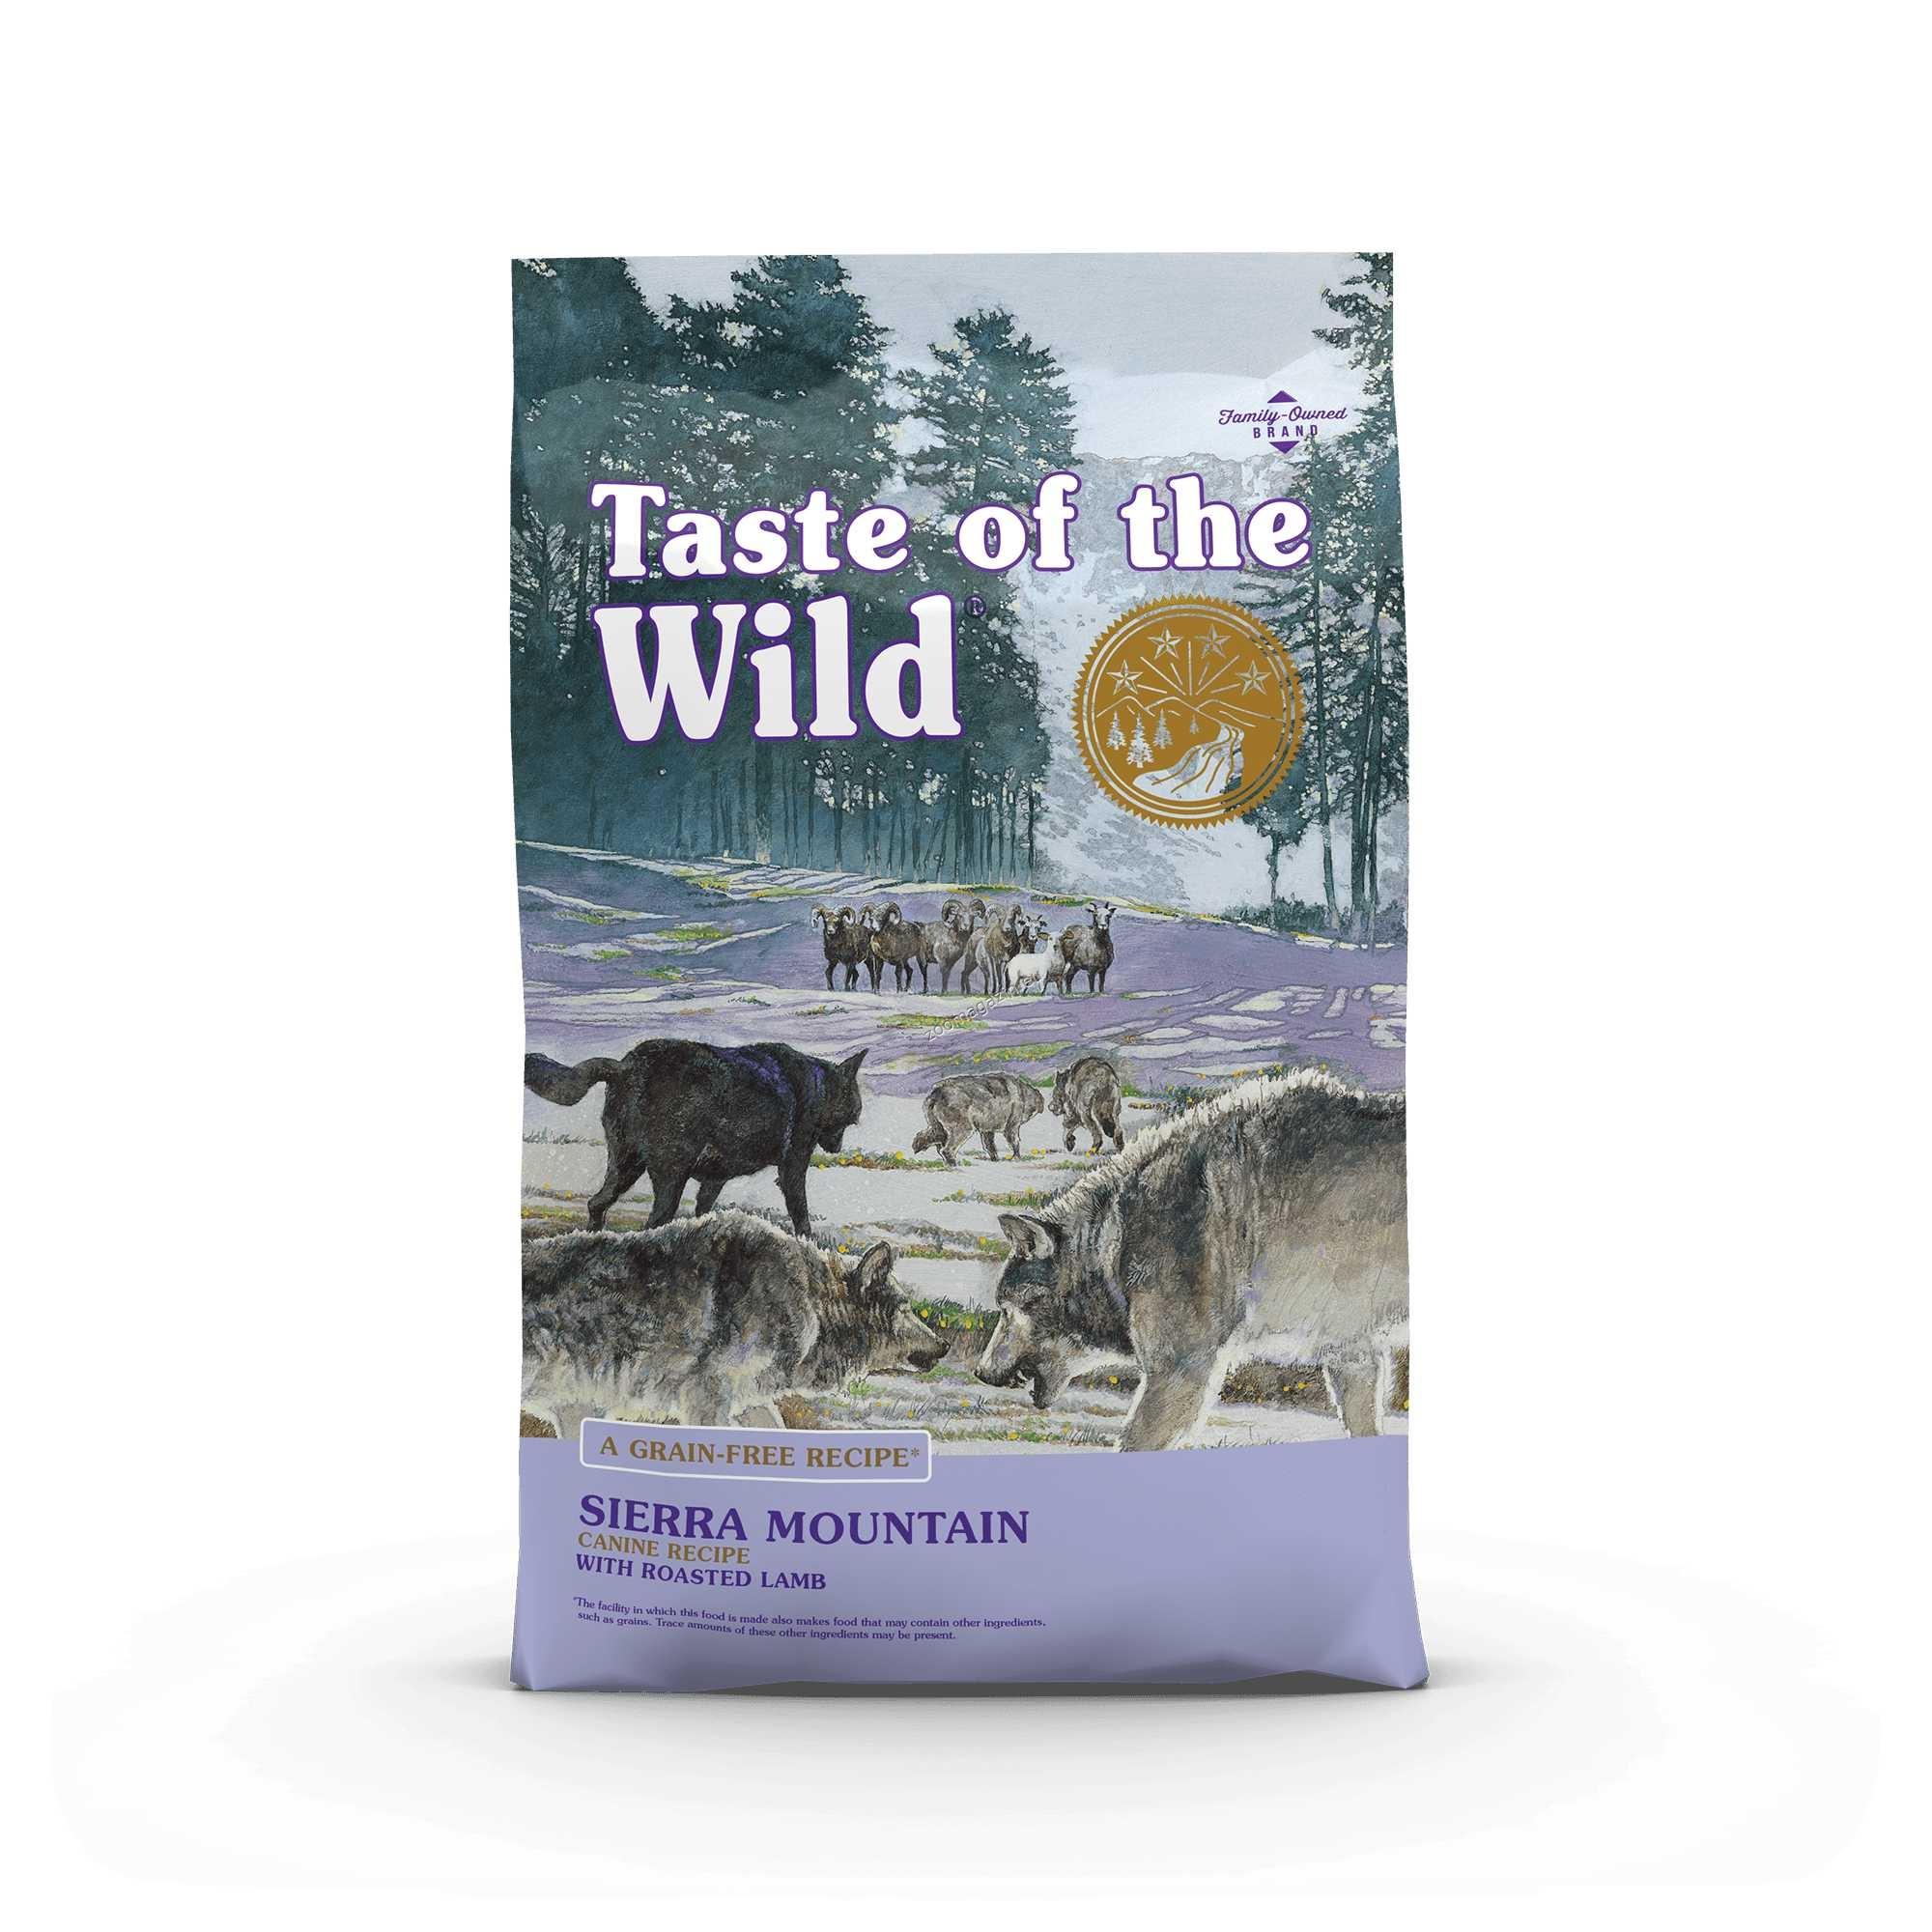 Taste of the Wild Sierra Mountain Canine Formula with Roasted Lamb - храна за кучета с печено агнешко месо 12.2 кг.